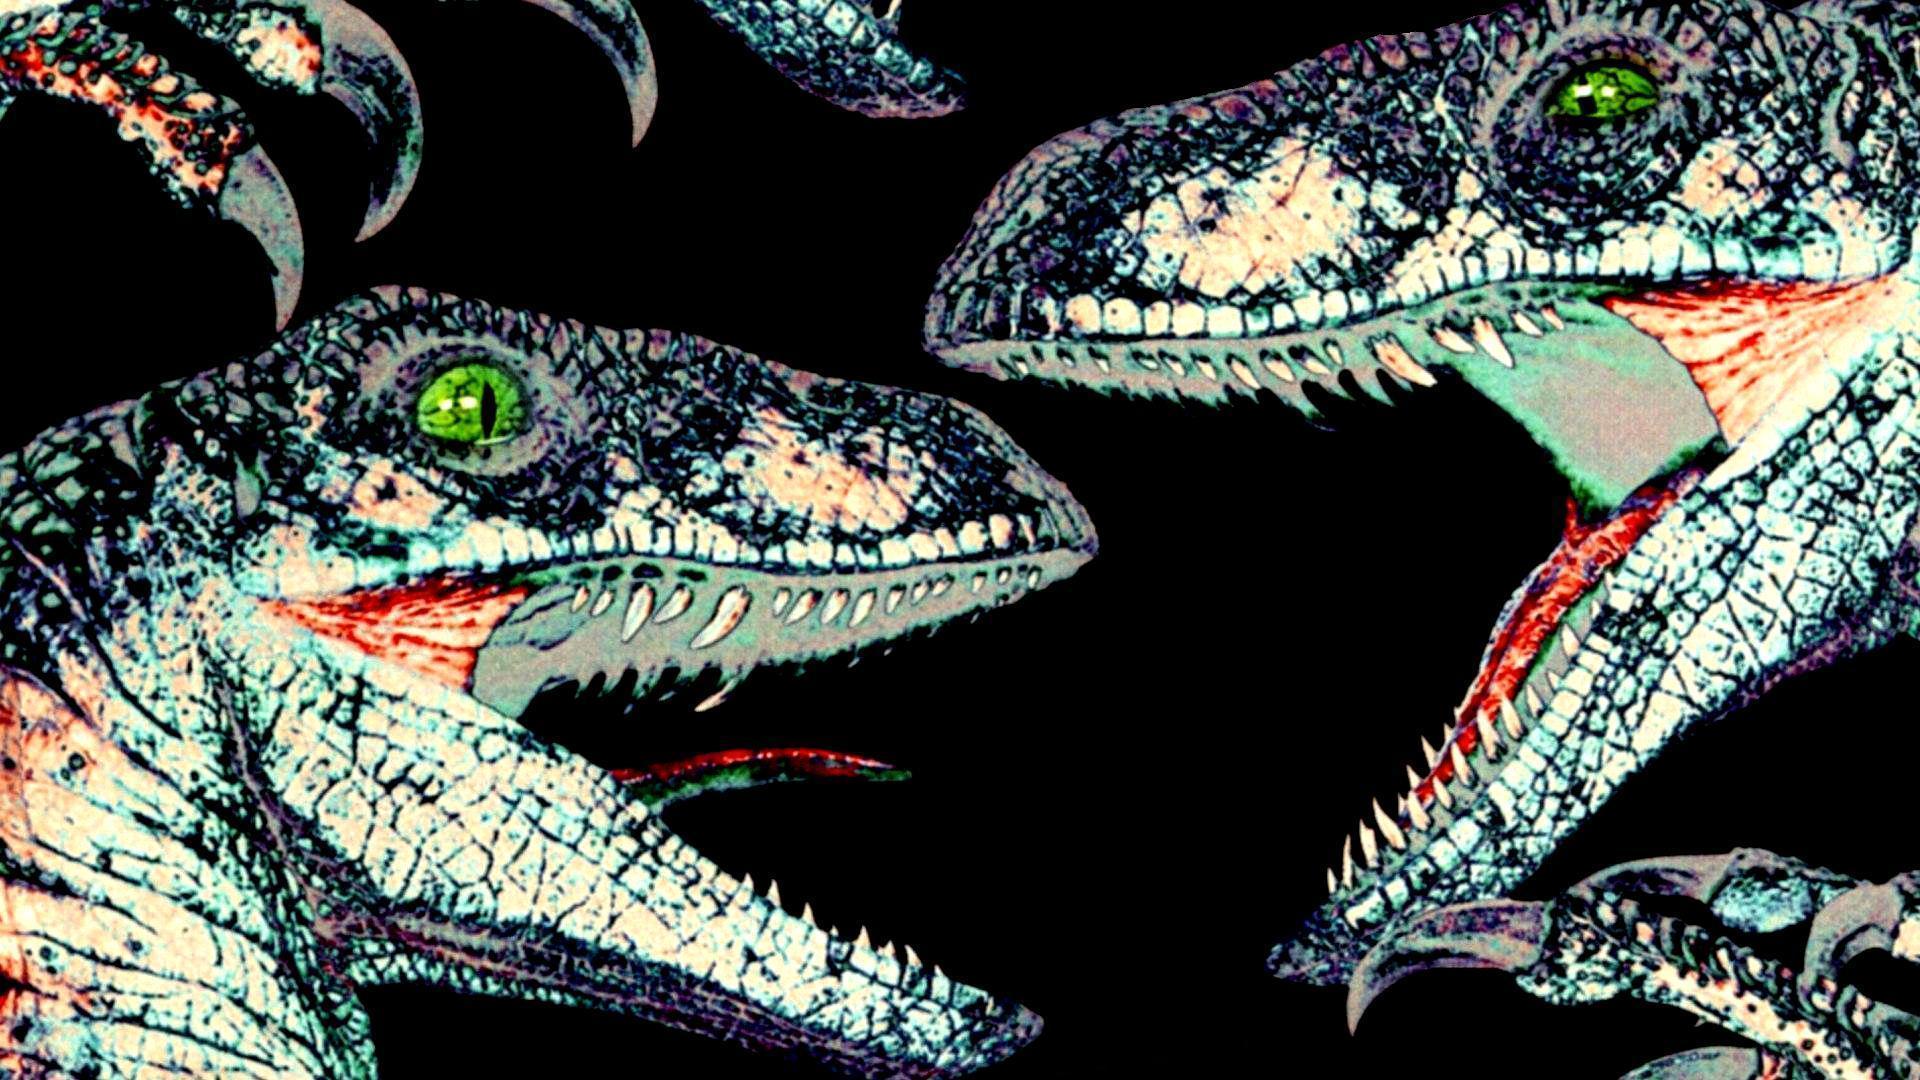 velociraptor wallpapers wallpaper cave